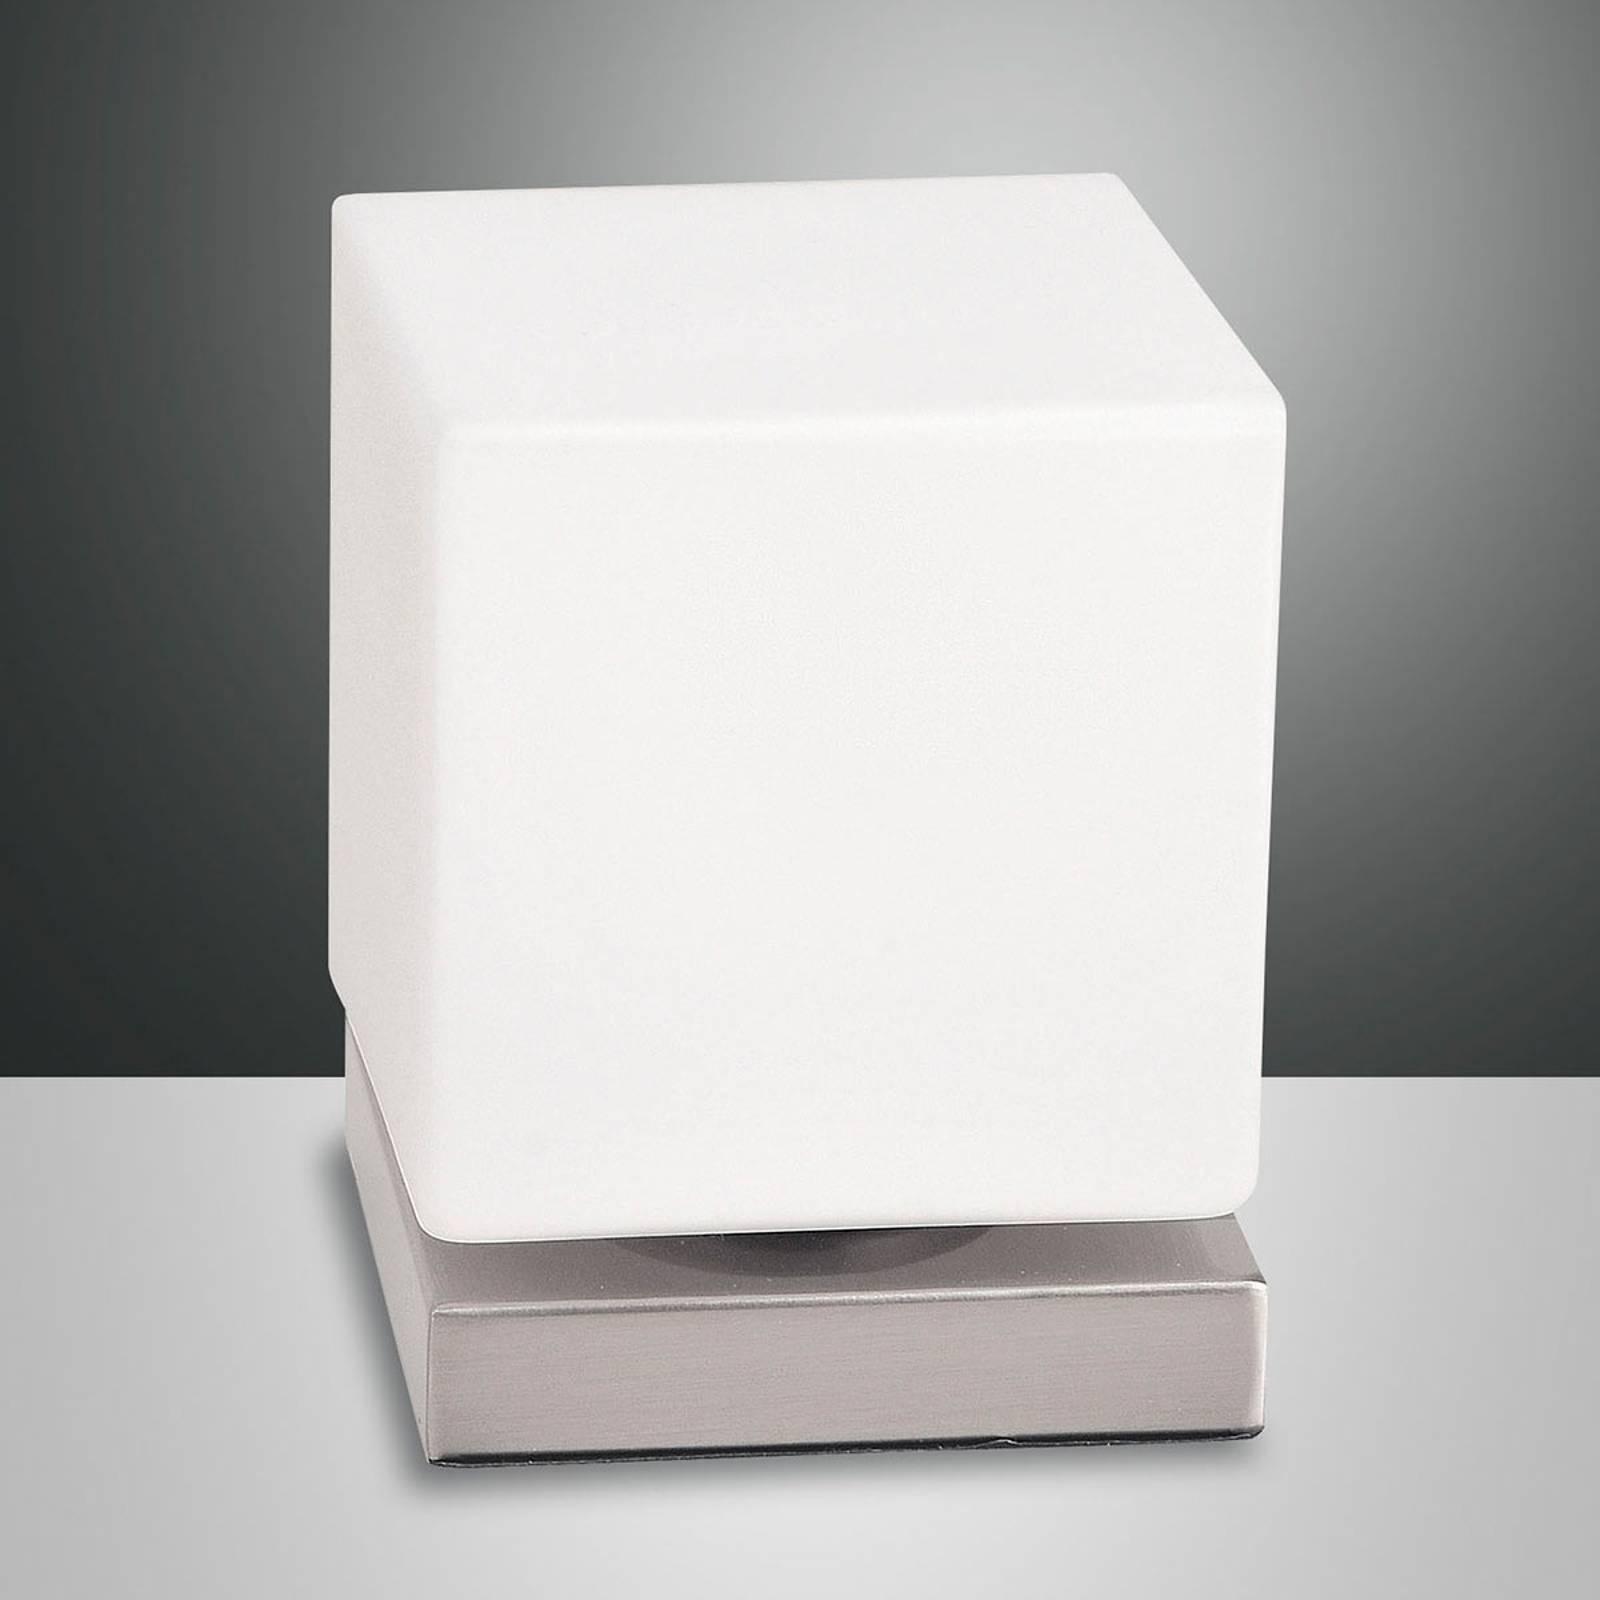 Kosketushimmennin LED-pöytälamppu Brenta nikkeli